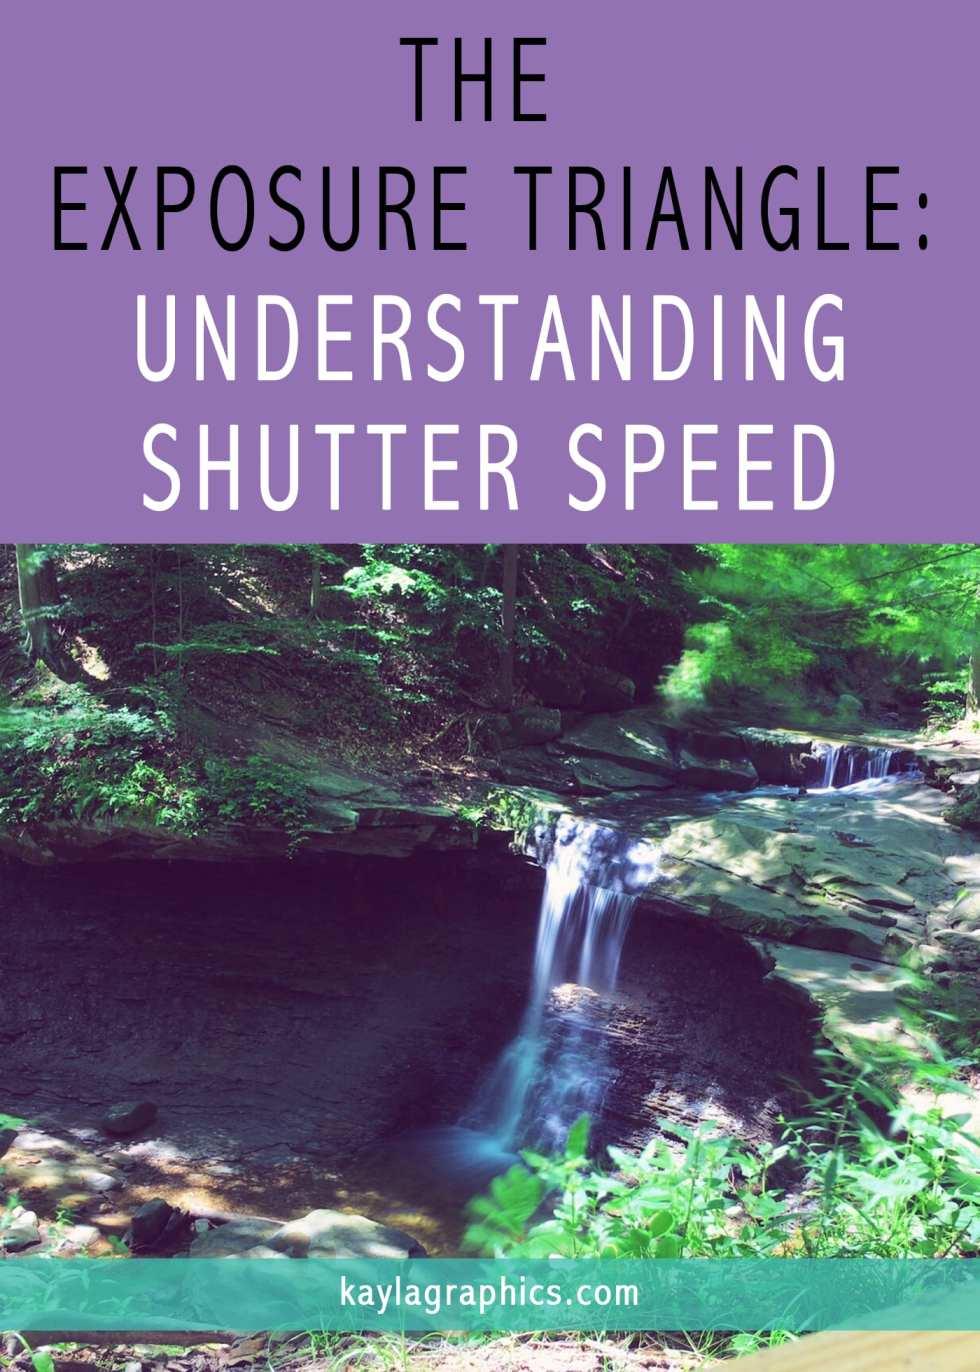 THE EXPOSURE TRIANGLE UNDERSTANDING SHUTTER SPEED